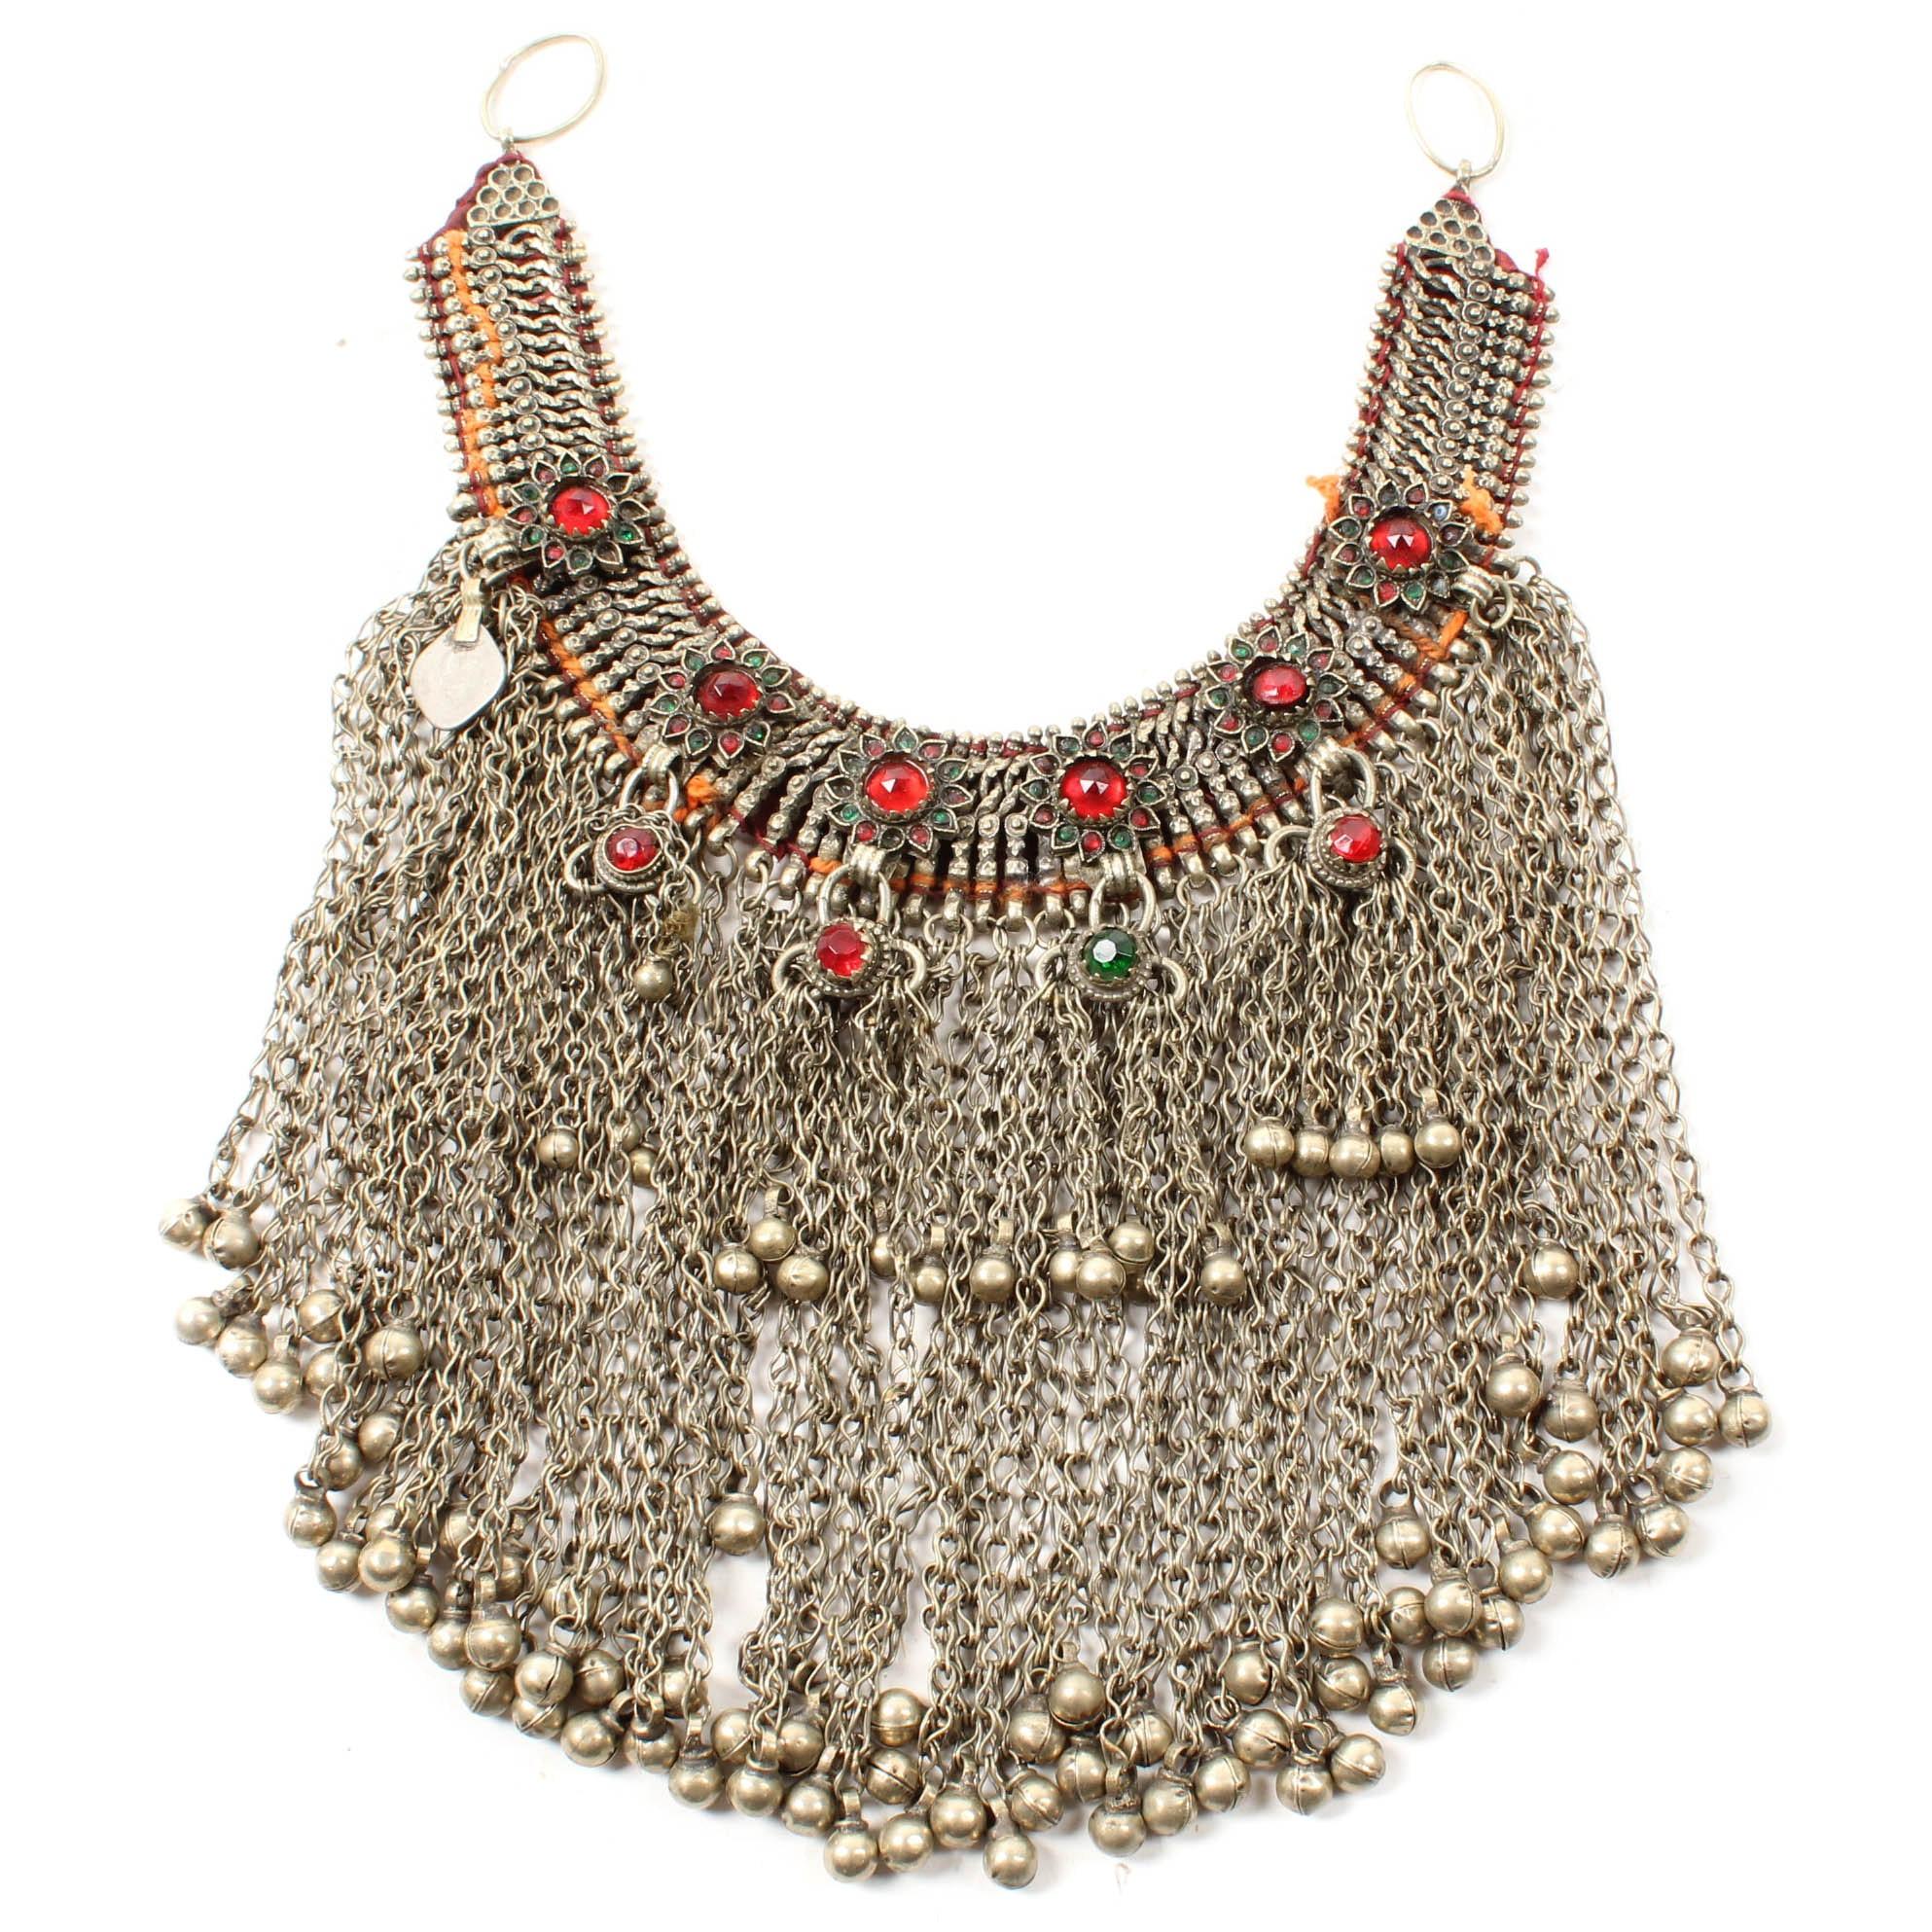 Vintage Bedouin Dancer Necklace